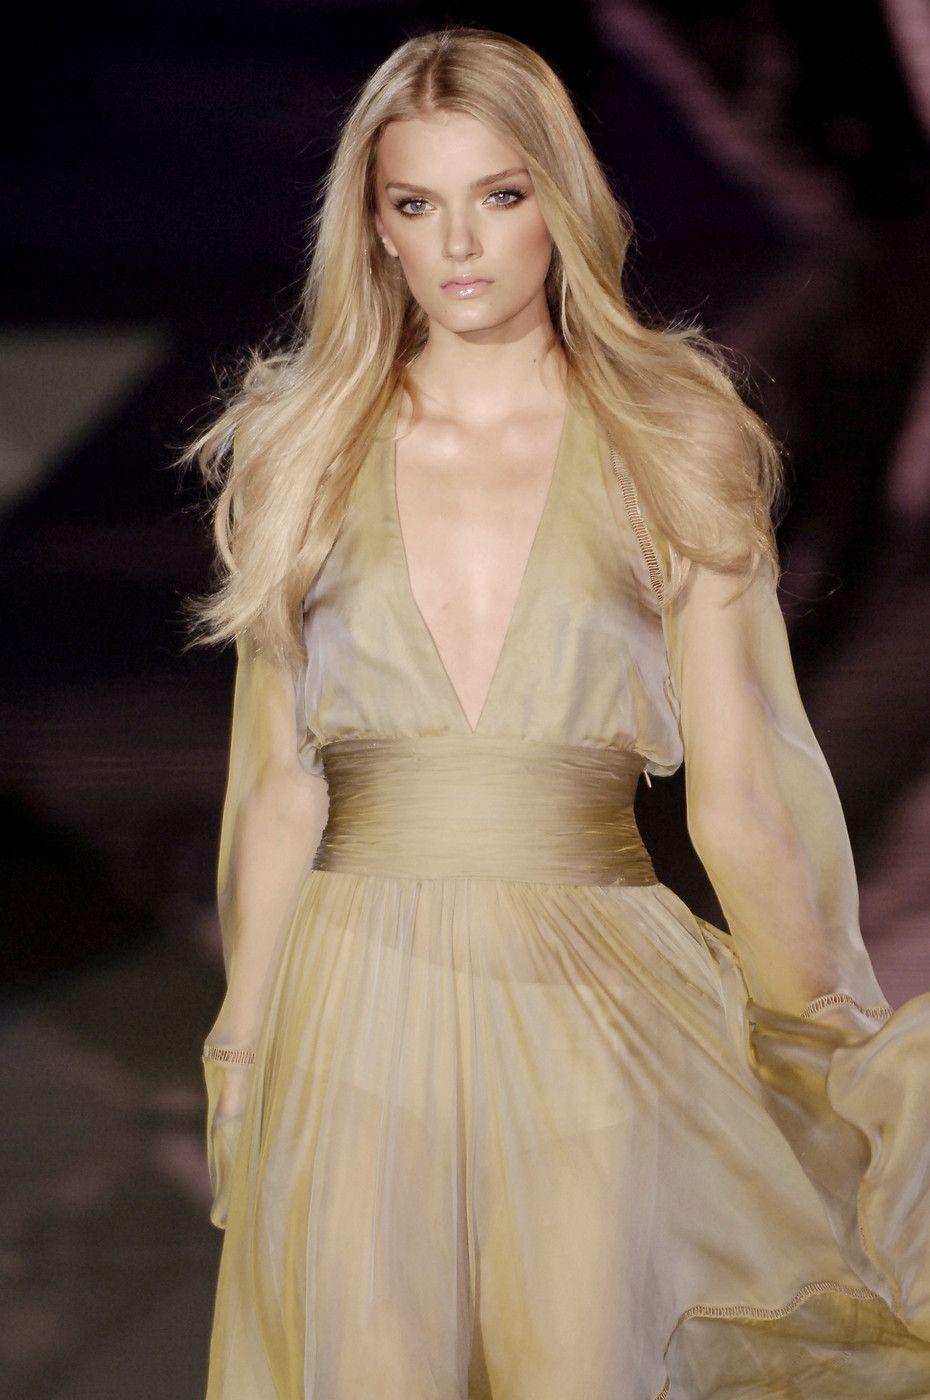 Versace wedding dress  Versace  Versace  Pinterest  Versace Lily donaldson and Milan